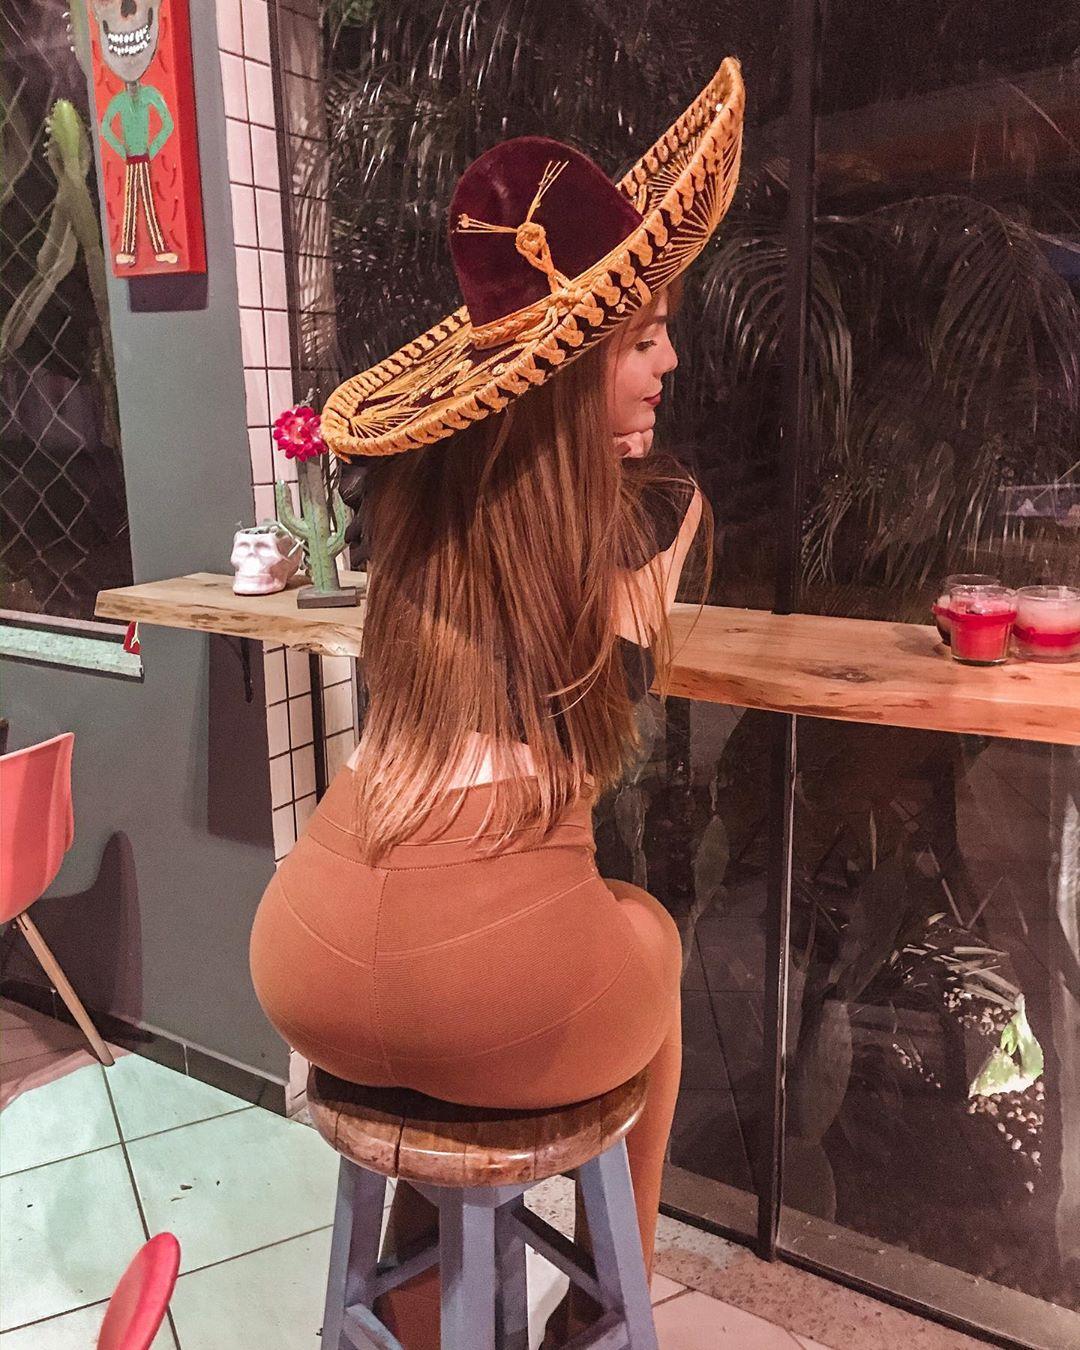 nathalie de oliveira, miss bom jardim 2019/1st runner-up de miss international queen 2016. - Página 9 76788211